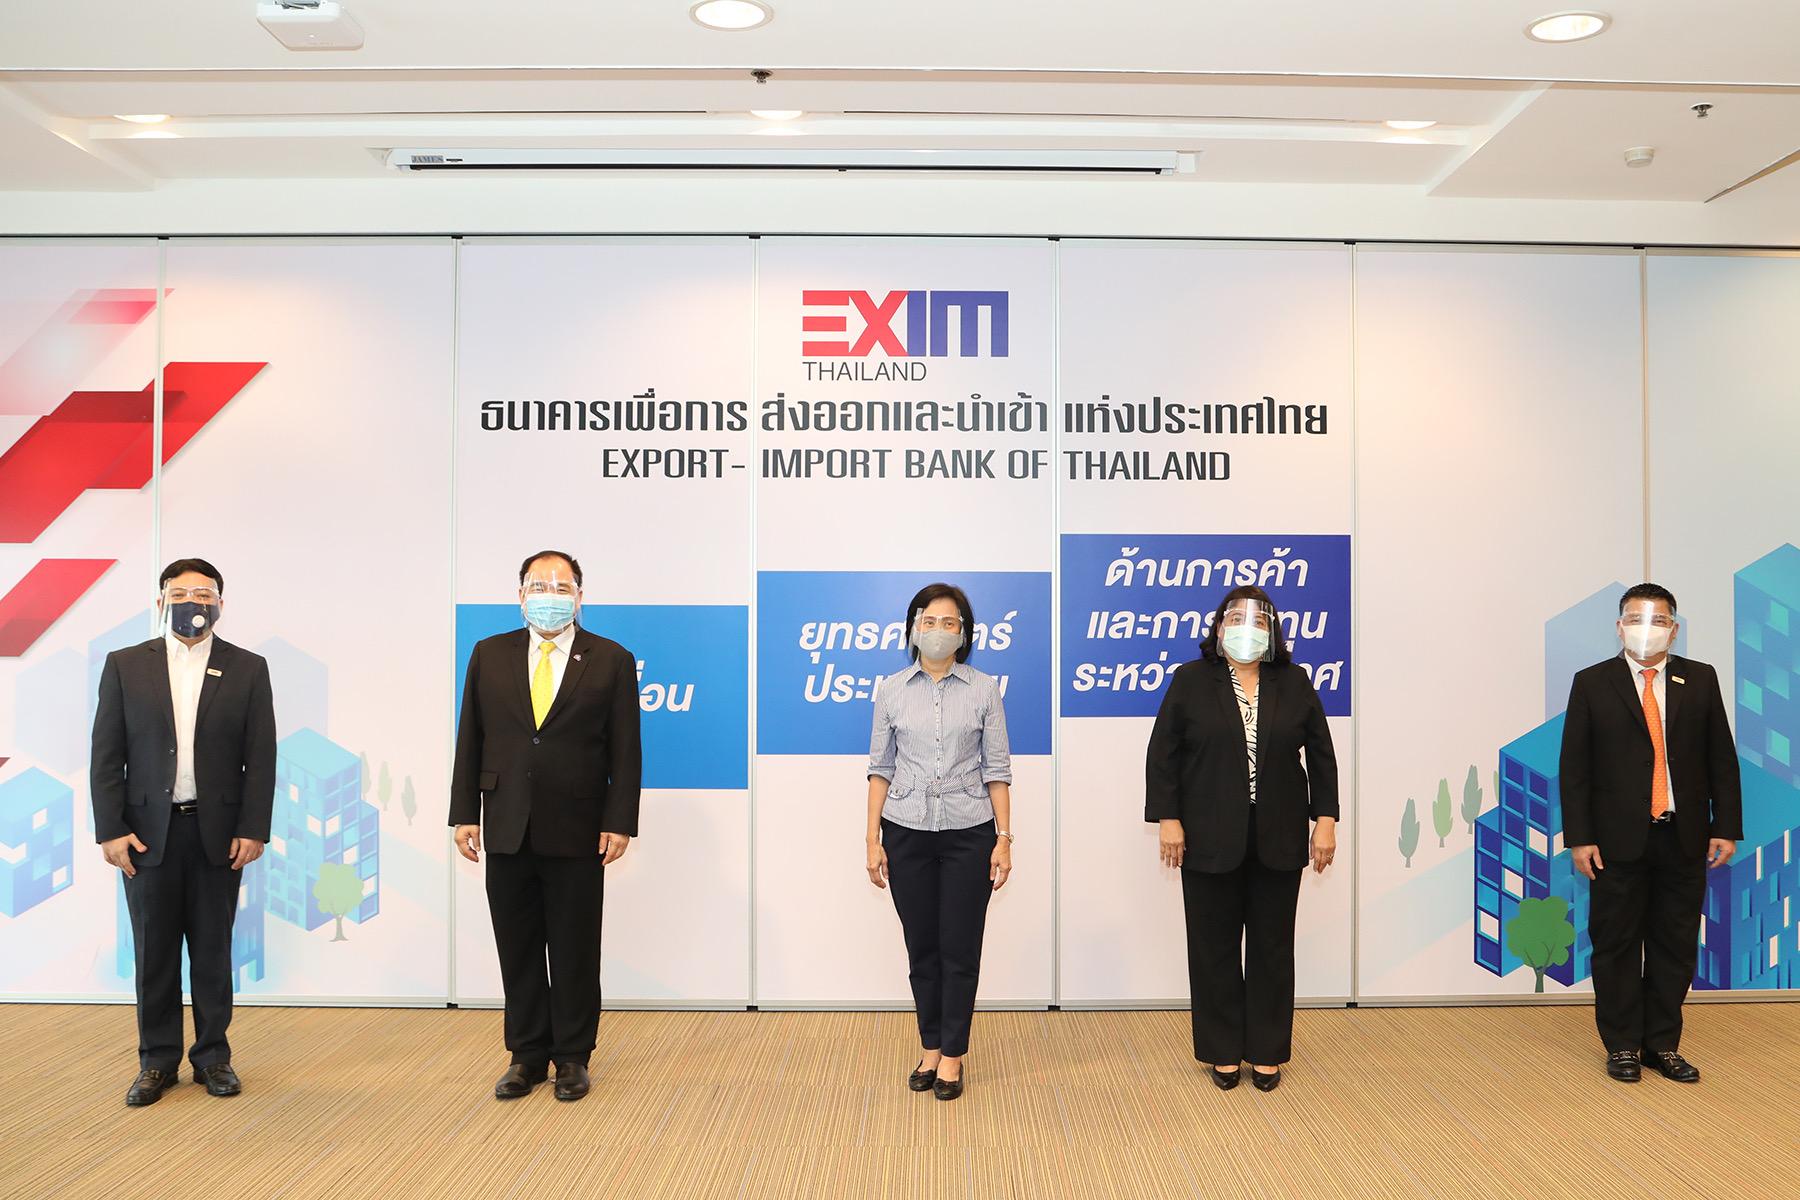 EXIM BANK จัดสัมมนาออนไลน์ตรวจสุขภาพการเงิน SMEs เพื่อเตรียมขอสินเชื่อ